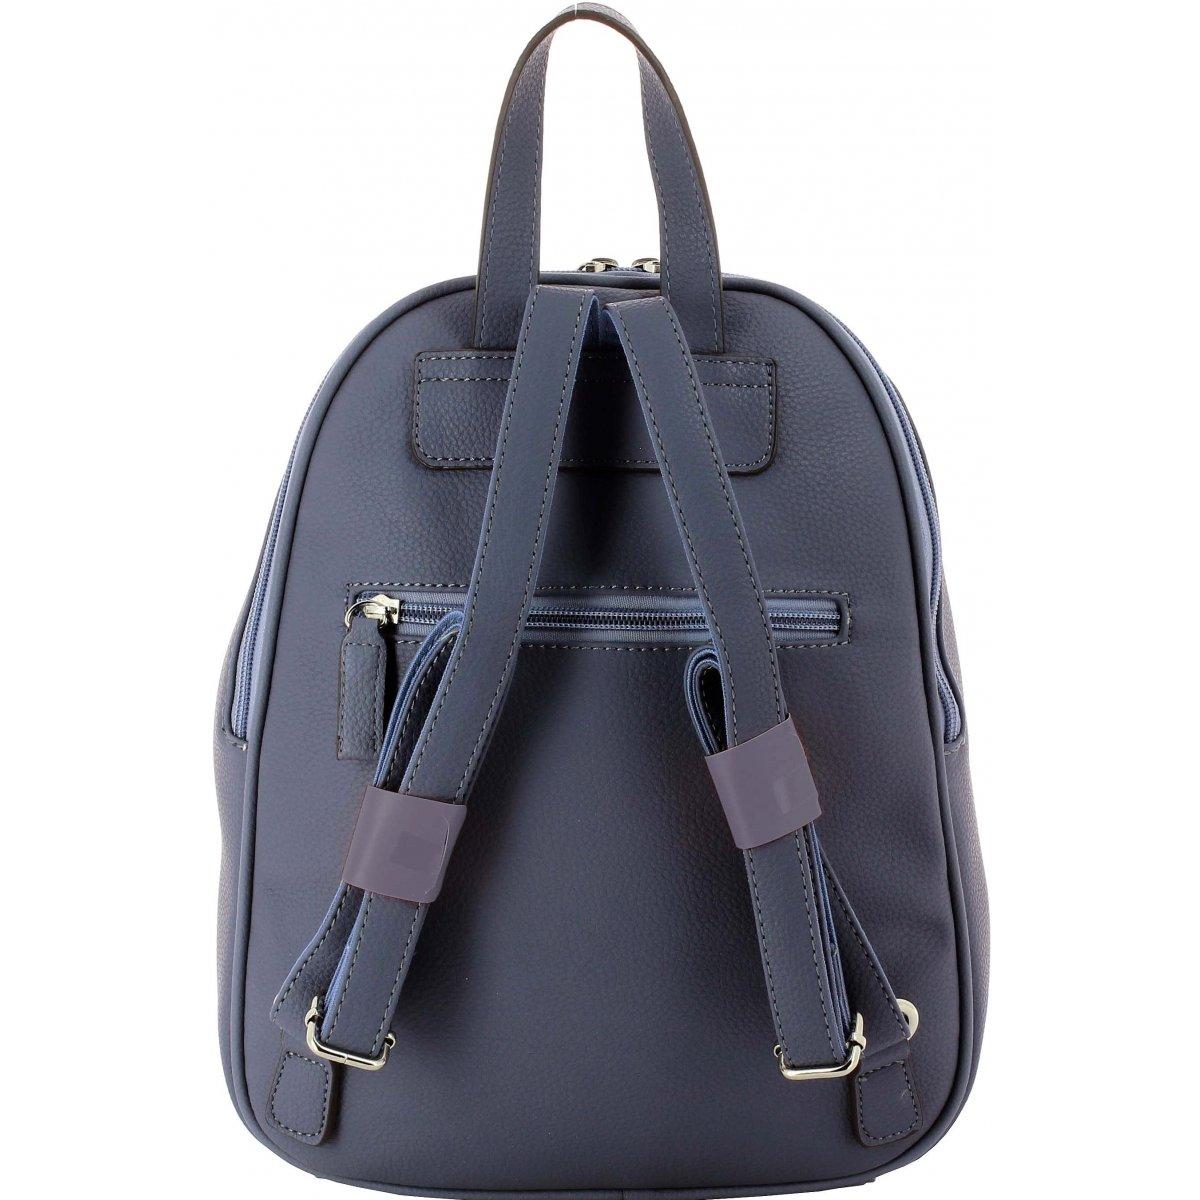 sac dos david jones djcm3018 couleur principale blue jean. Black Bedroom Furniture Sets. Home Design Ideas